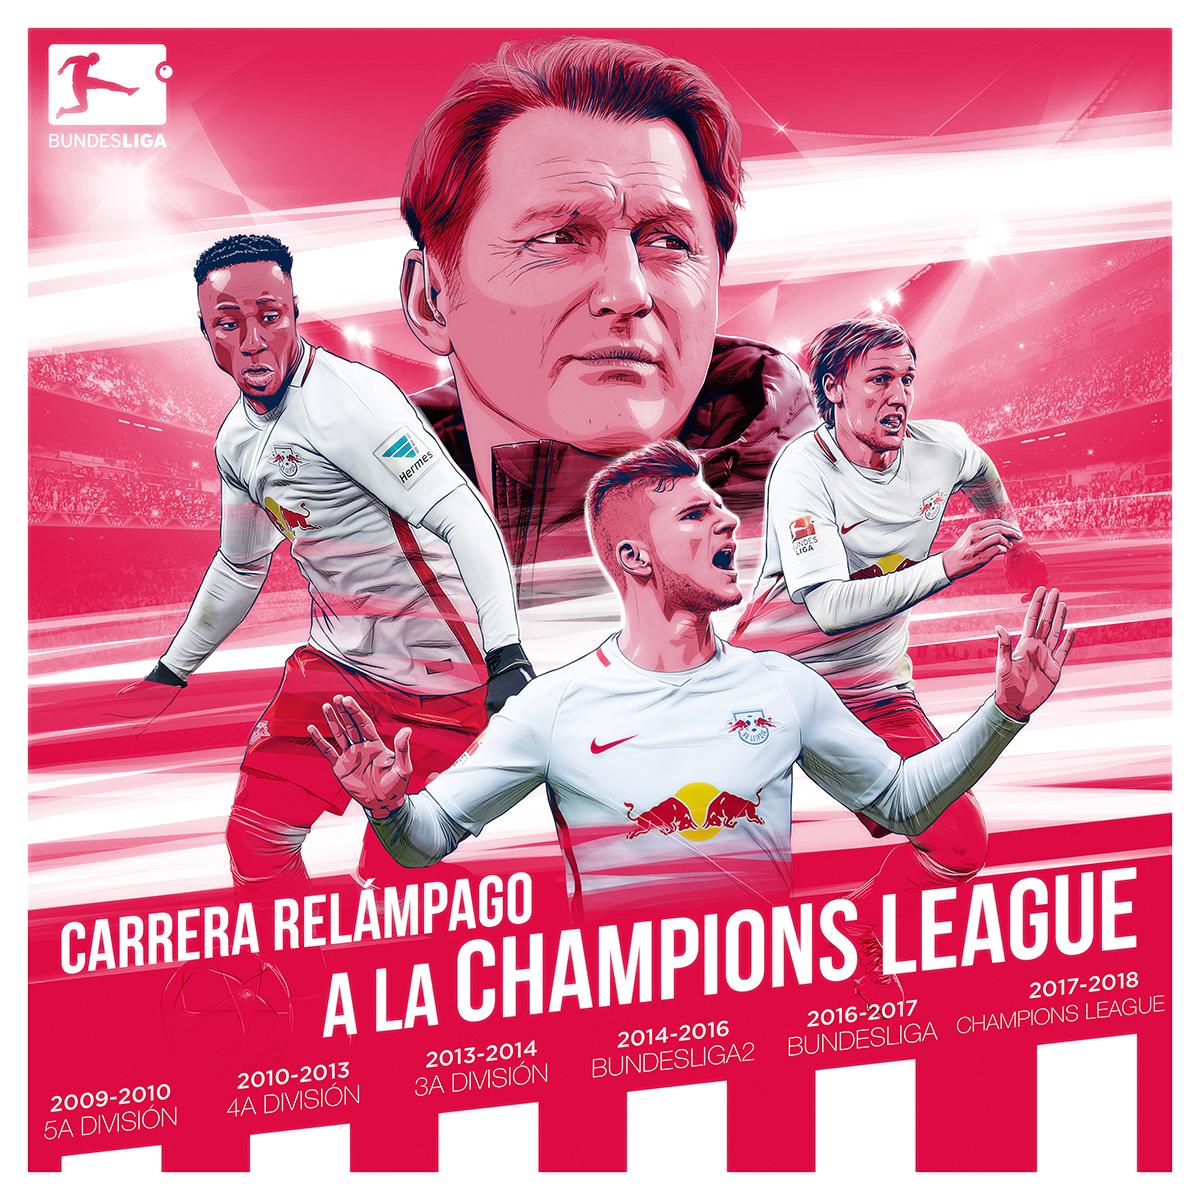 RB_Leipzig_Spanish_final_1200x1200.png